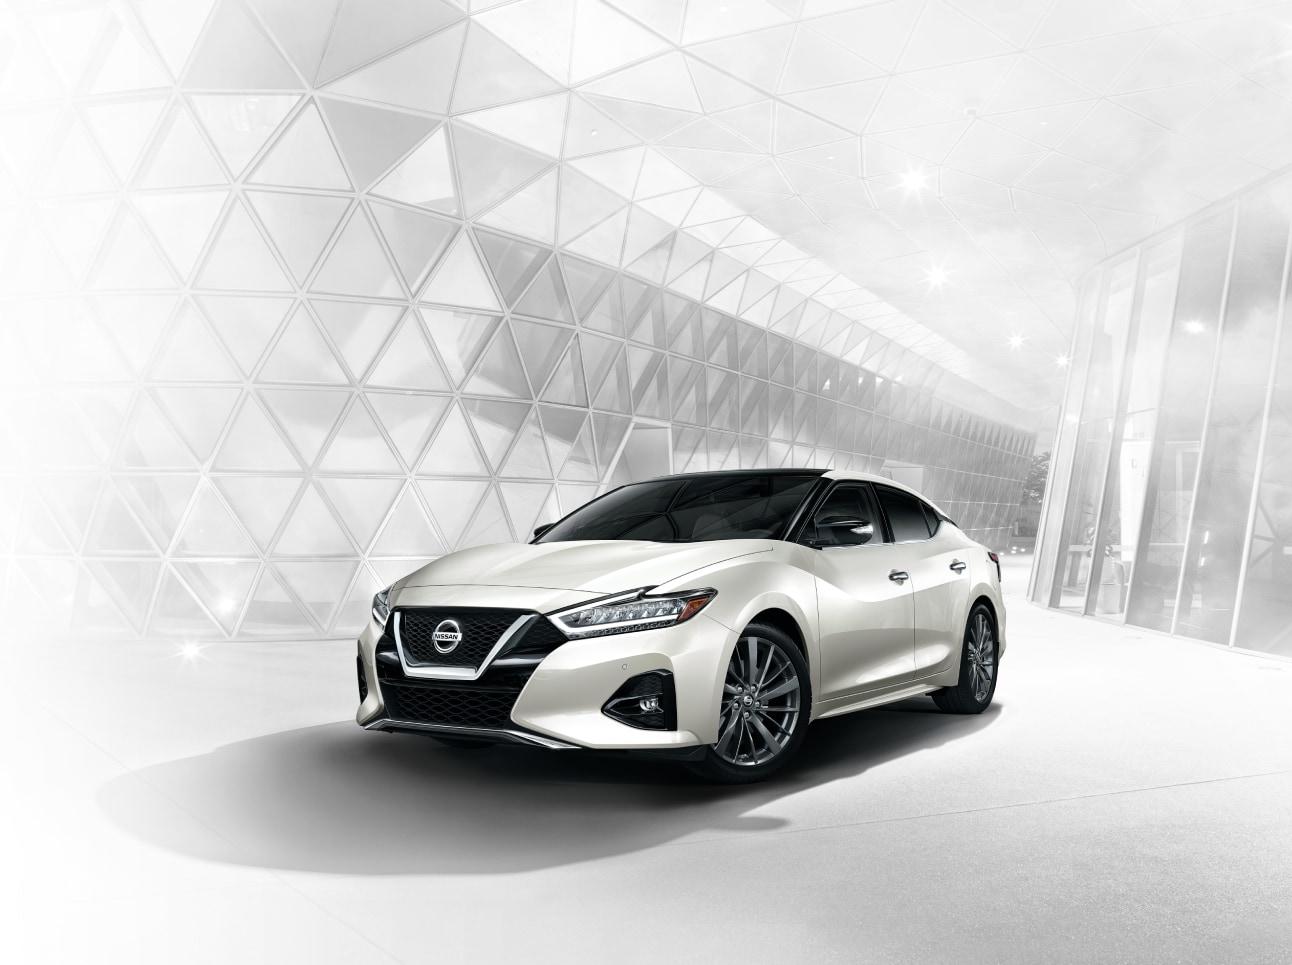 2020 Nissan Maxima Exterior 3/4 View